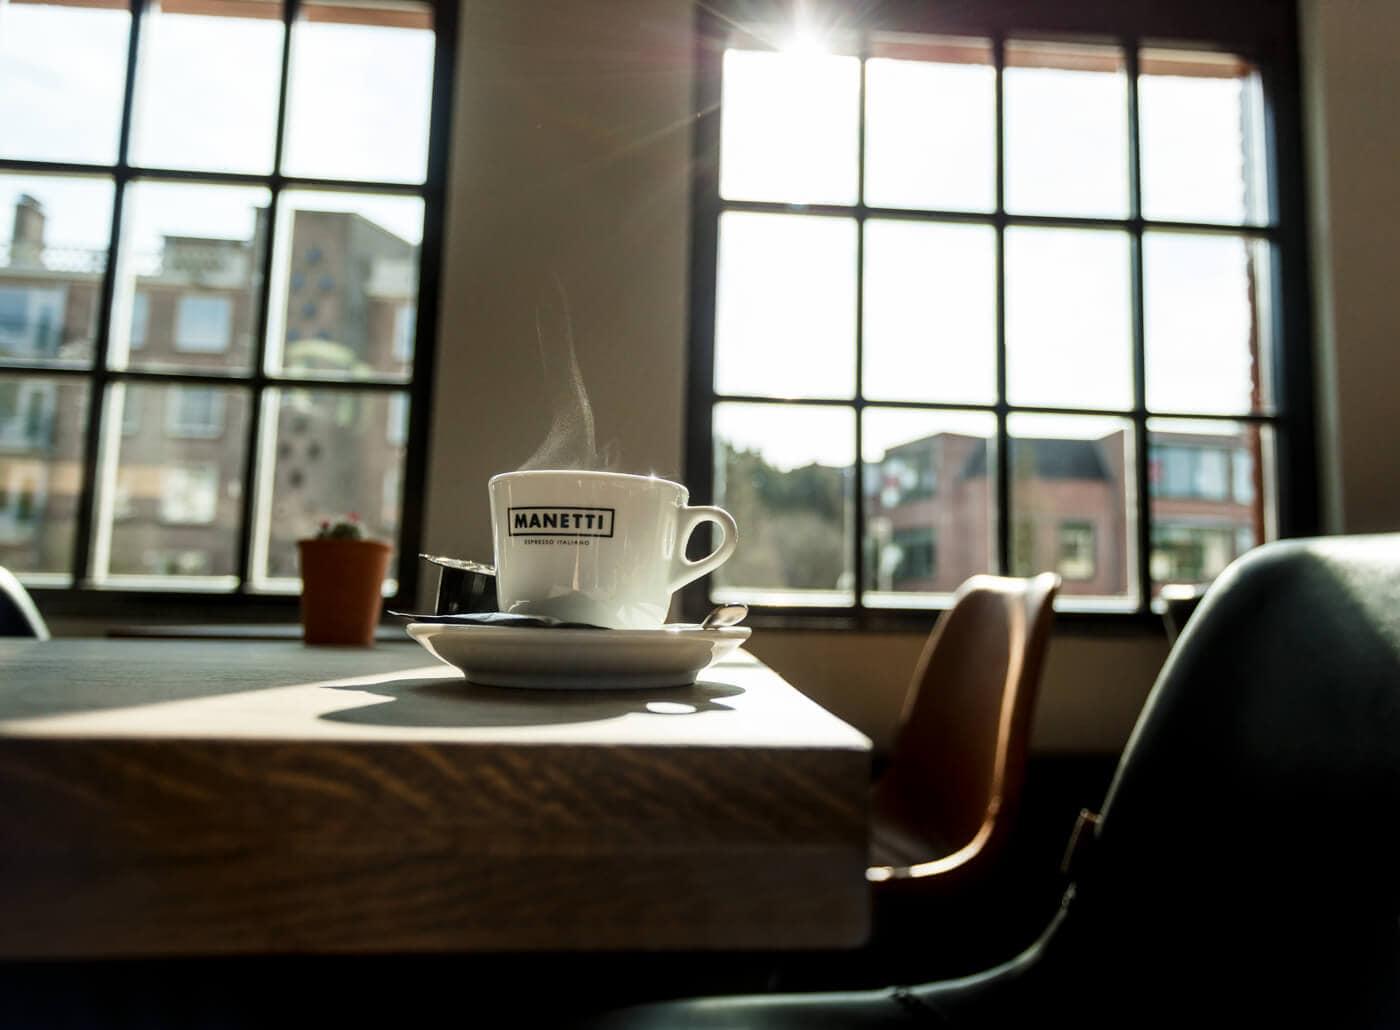 koffie-fotografie-manetti-bloemendaal-bleecker-coffee-and-more